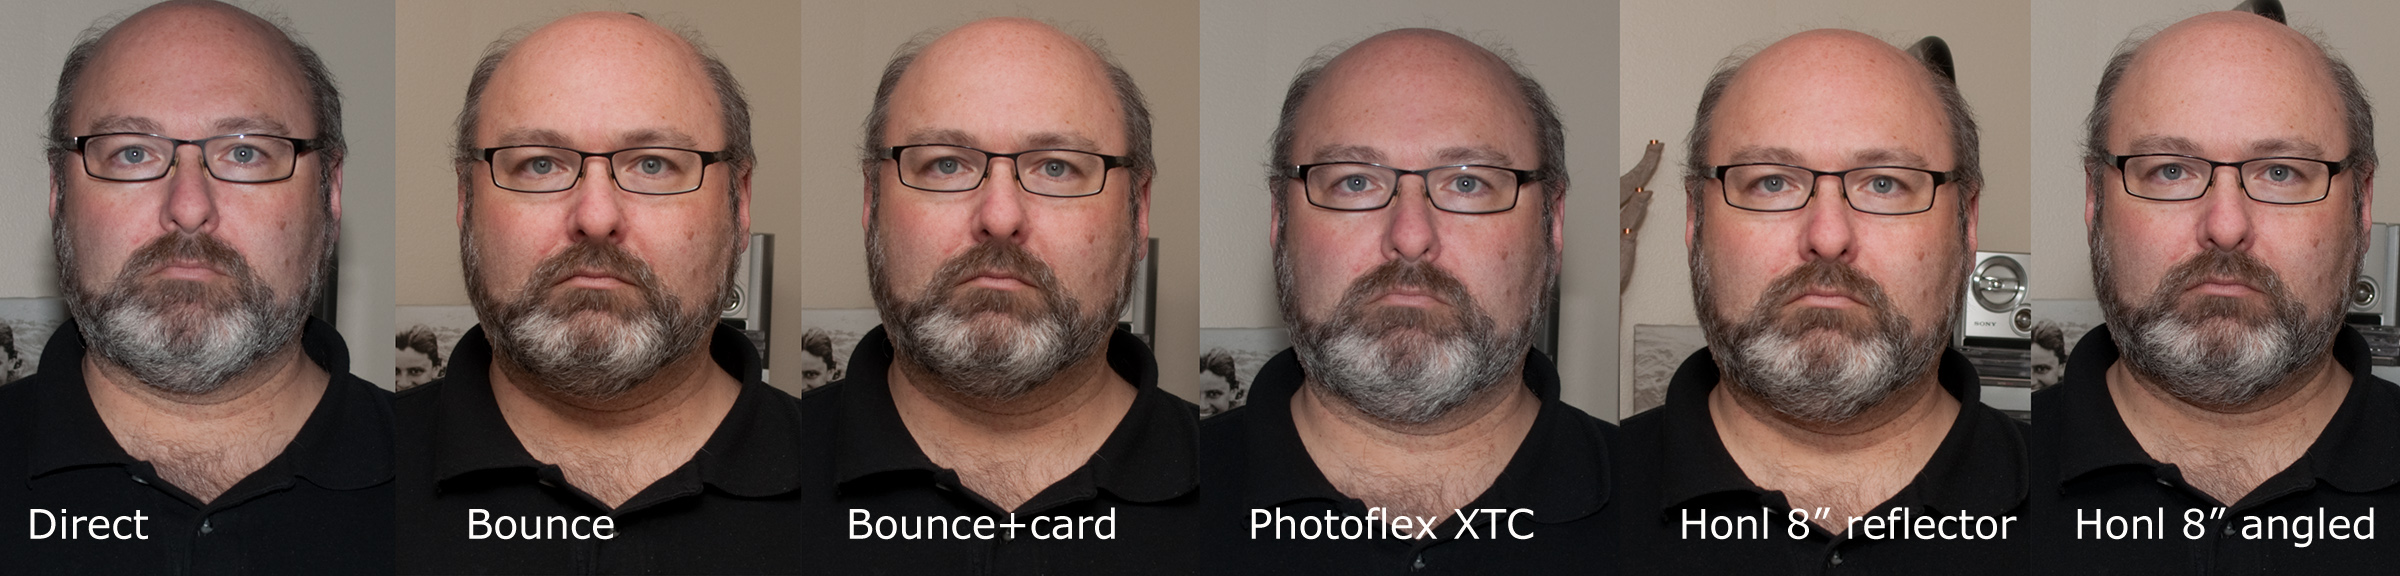 Comparing On-Camera Modifiers